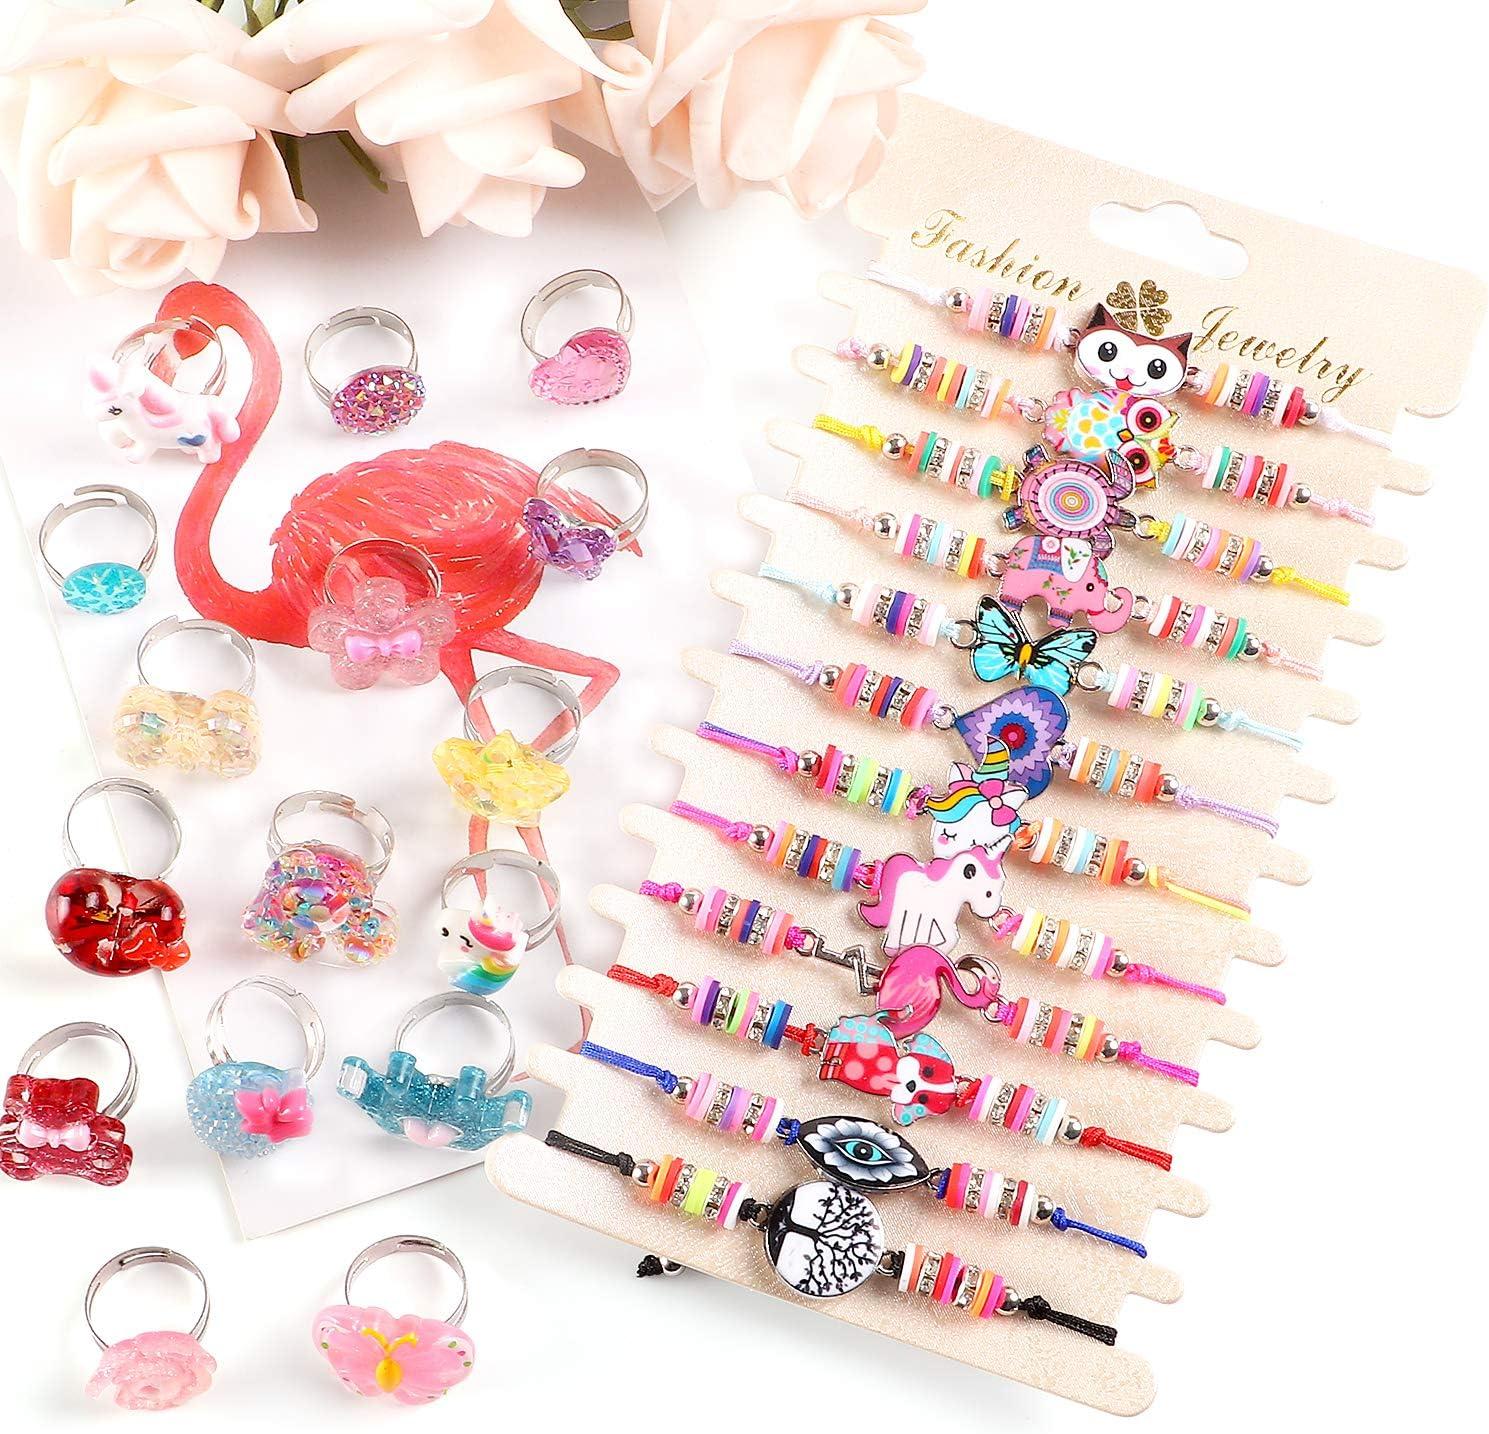 vamei 28PCS Friendship Bracelets Girls with Rings Unicorn Butterfly Bracelets Adjustable Braided Bracelet Cute Pink Jewellery Bracelets for Girls Party Bag Fillers for Kids